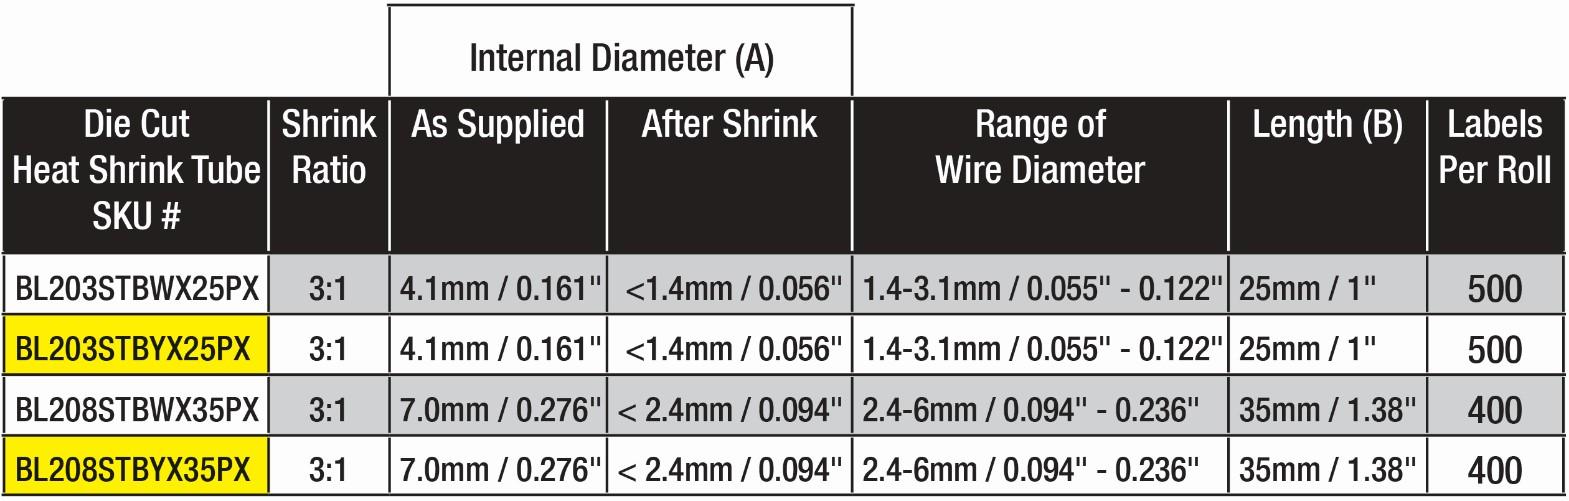 die_cut_shrink_tube_dimension_chart